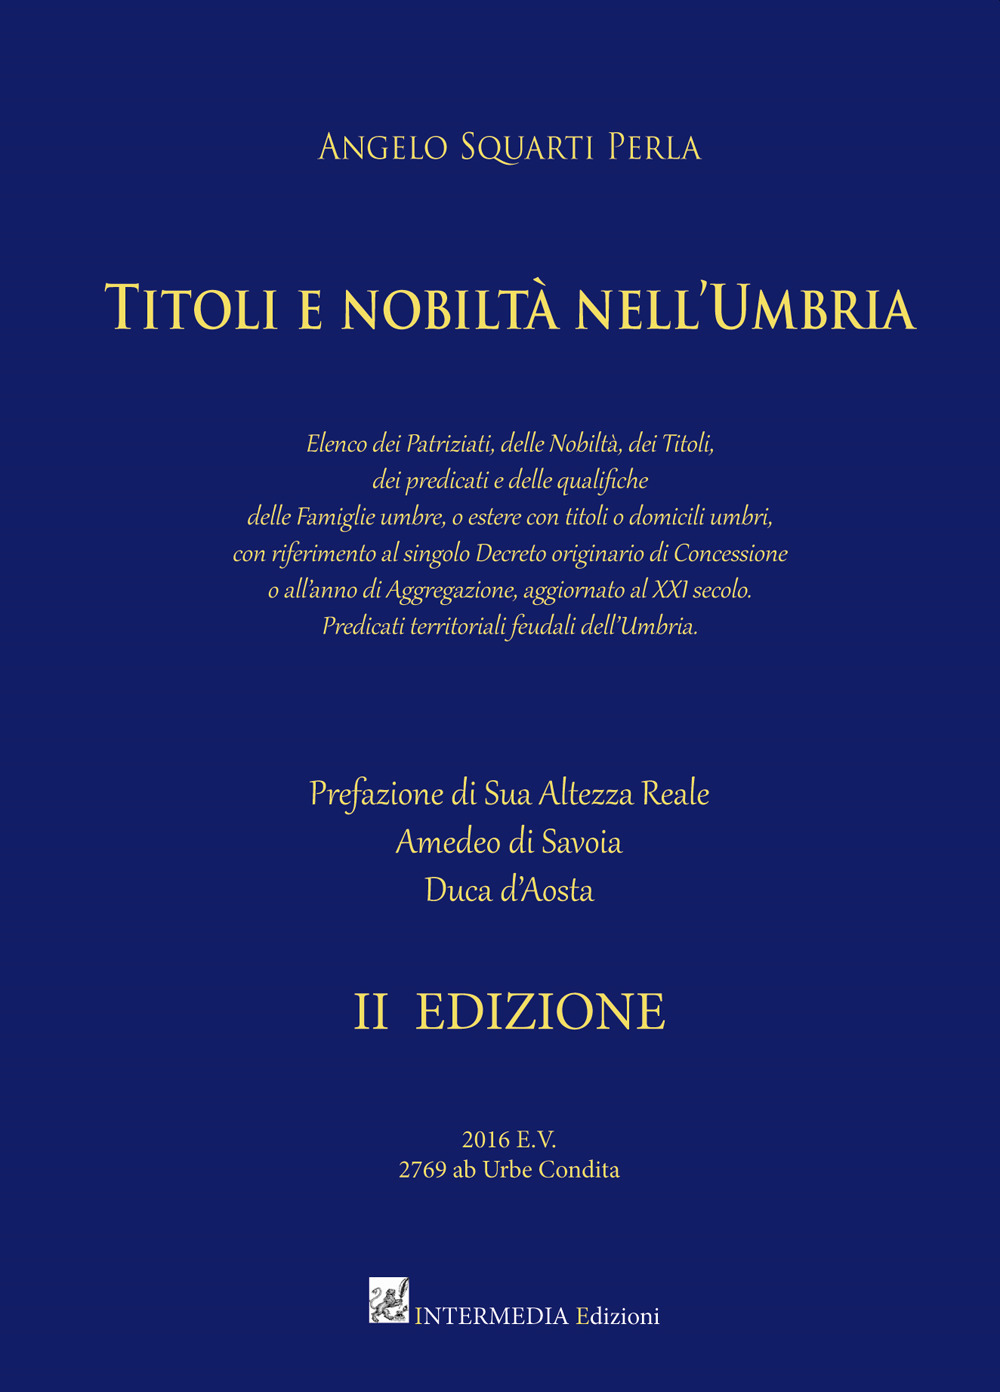 Titoli e nobiltà nell'Umbria